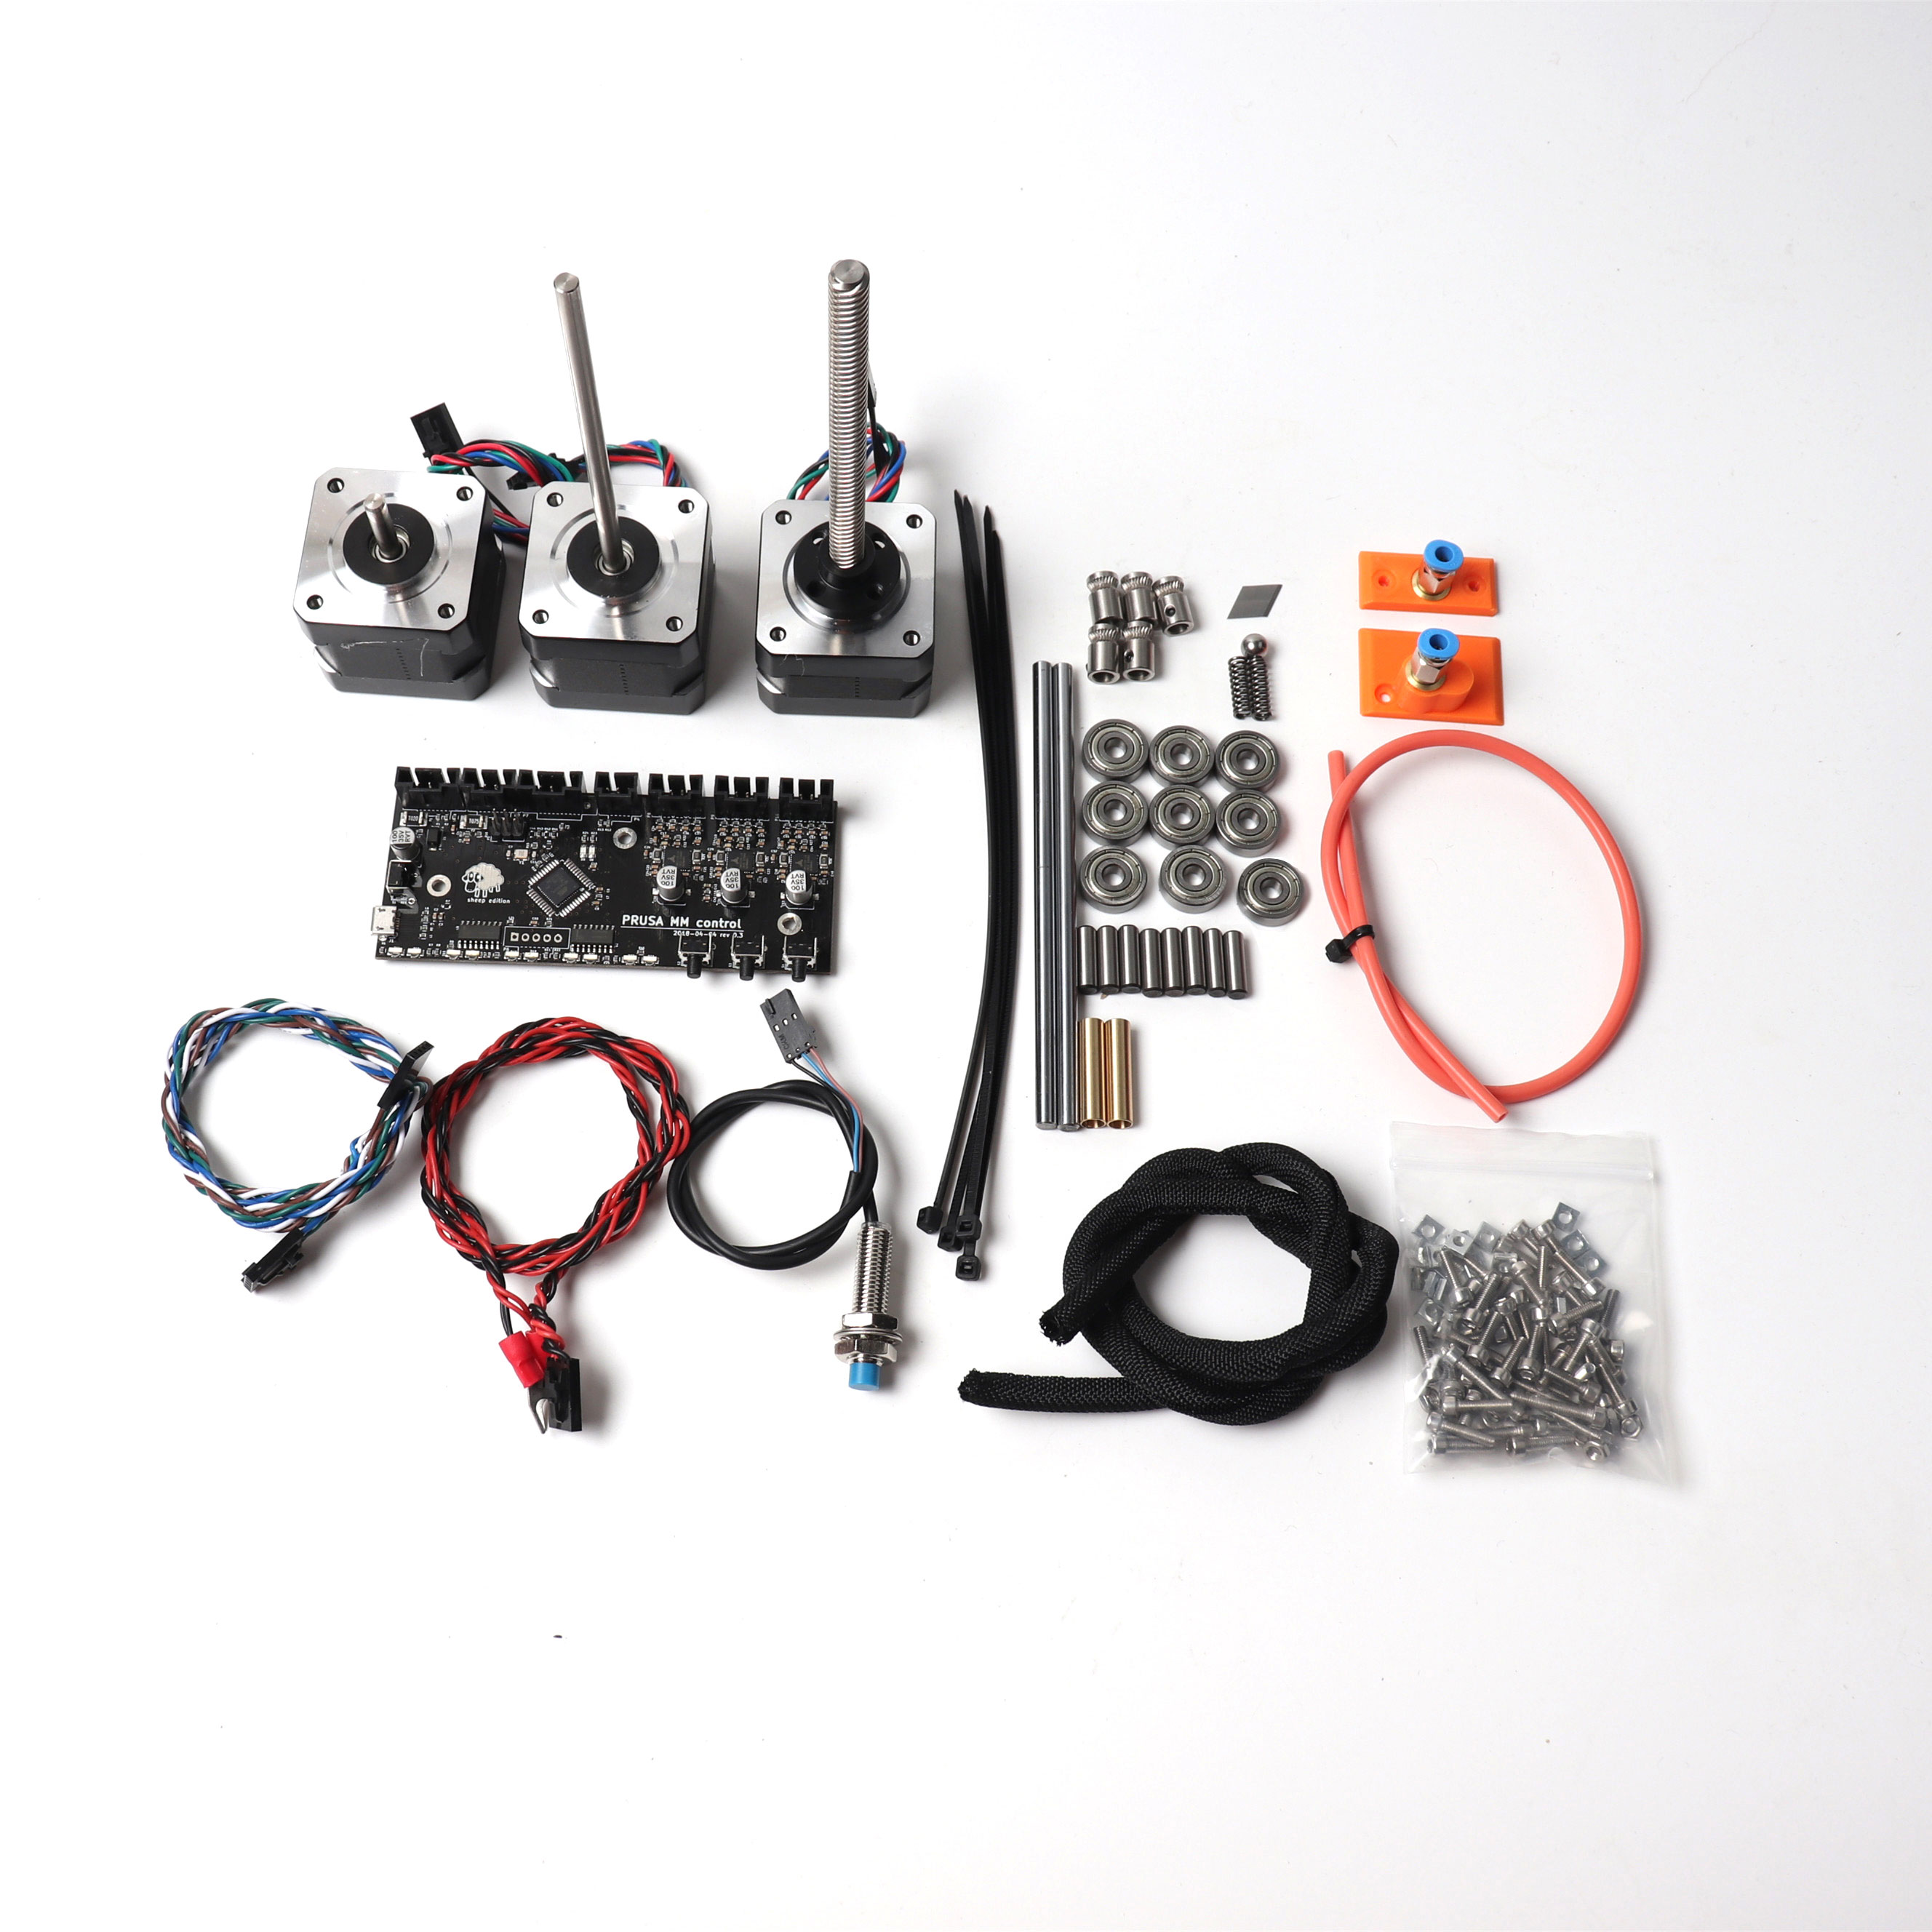 Kit Multi matériaux Prusa i3 MK2.5/MK3 MMU V2, carte de commande, kit moteurs, sonde FINDA, câbles d'alimentation et de signal, tiges lisses